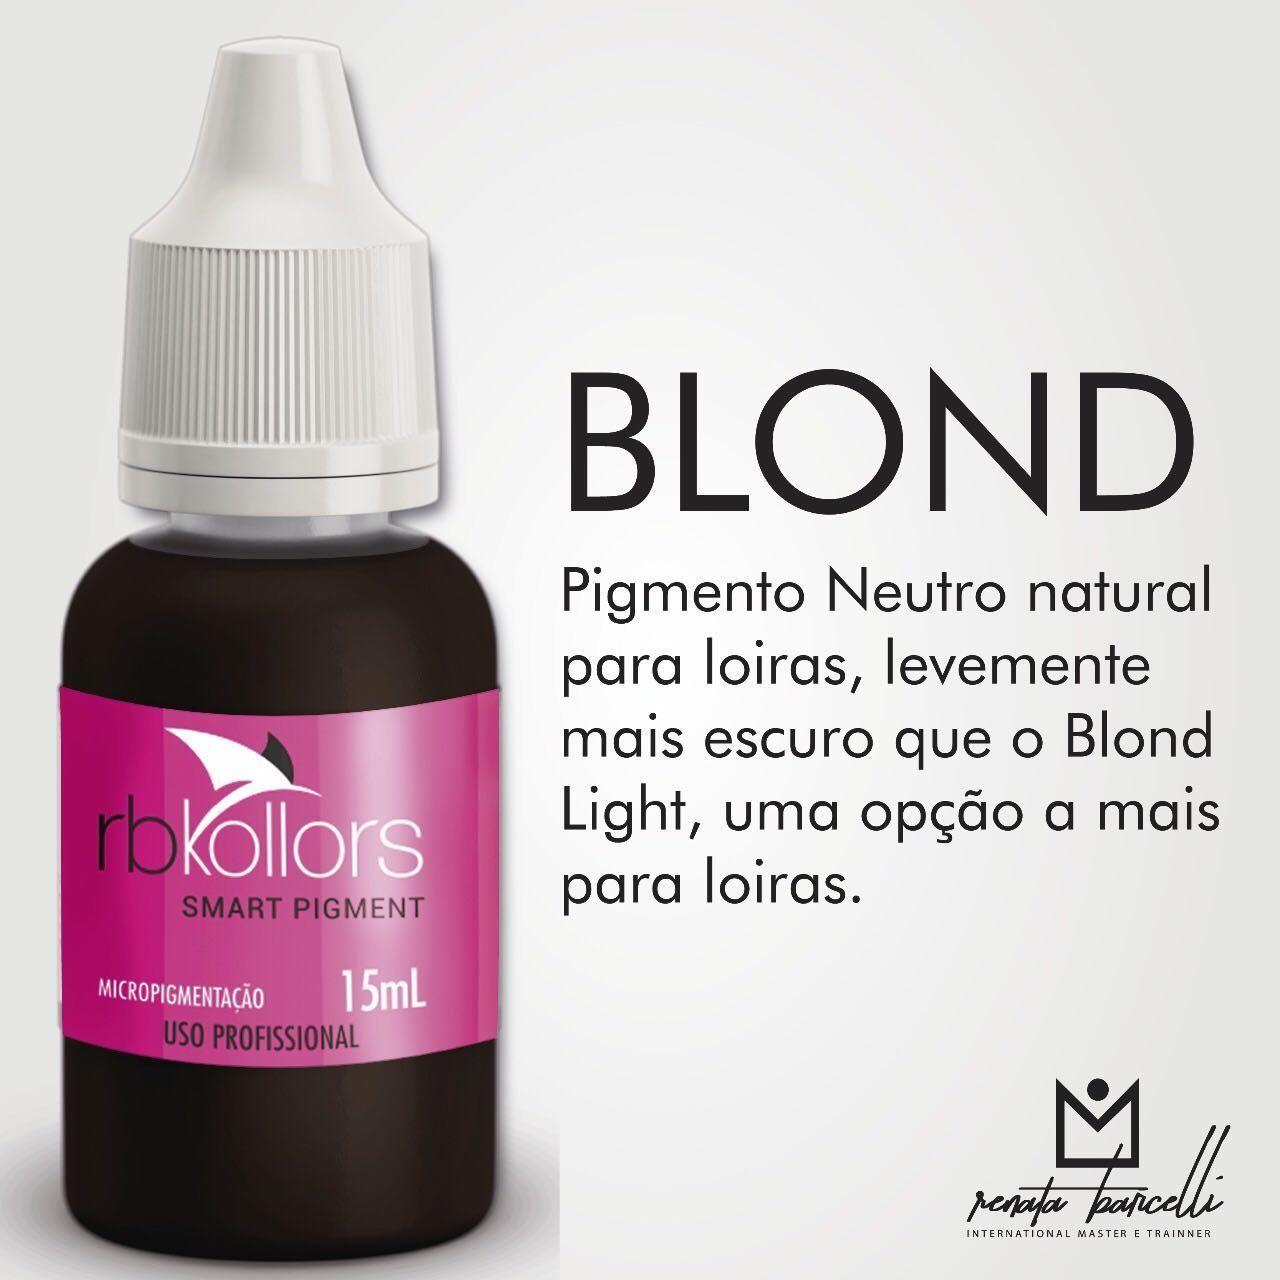 Pigmento Rb Kollors  Blond -15ml